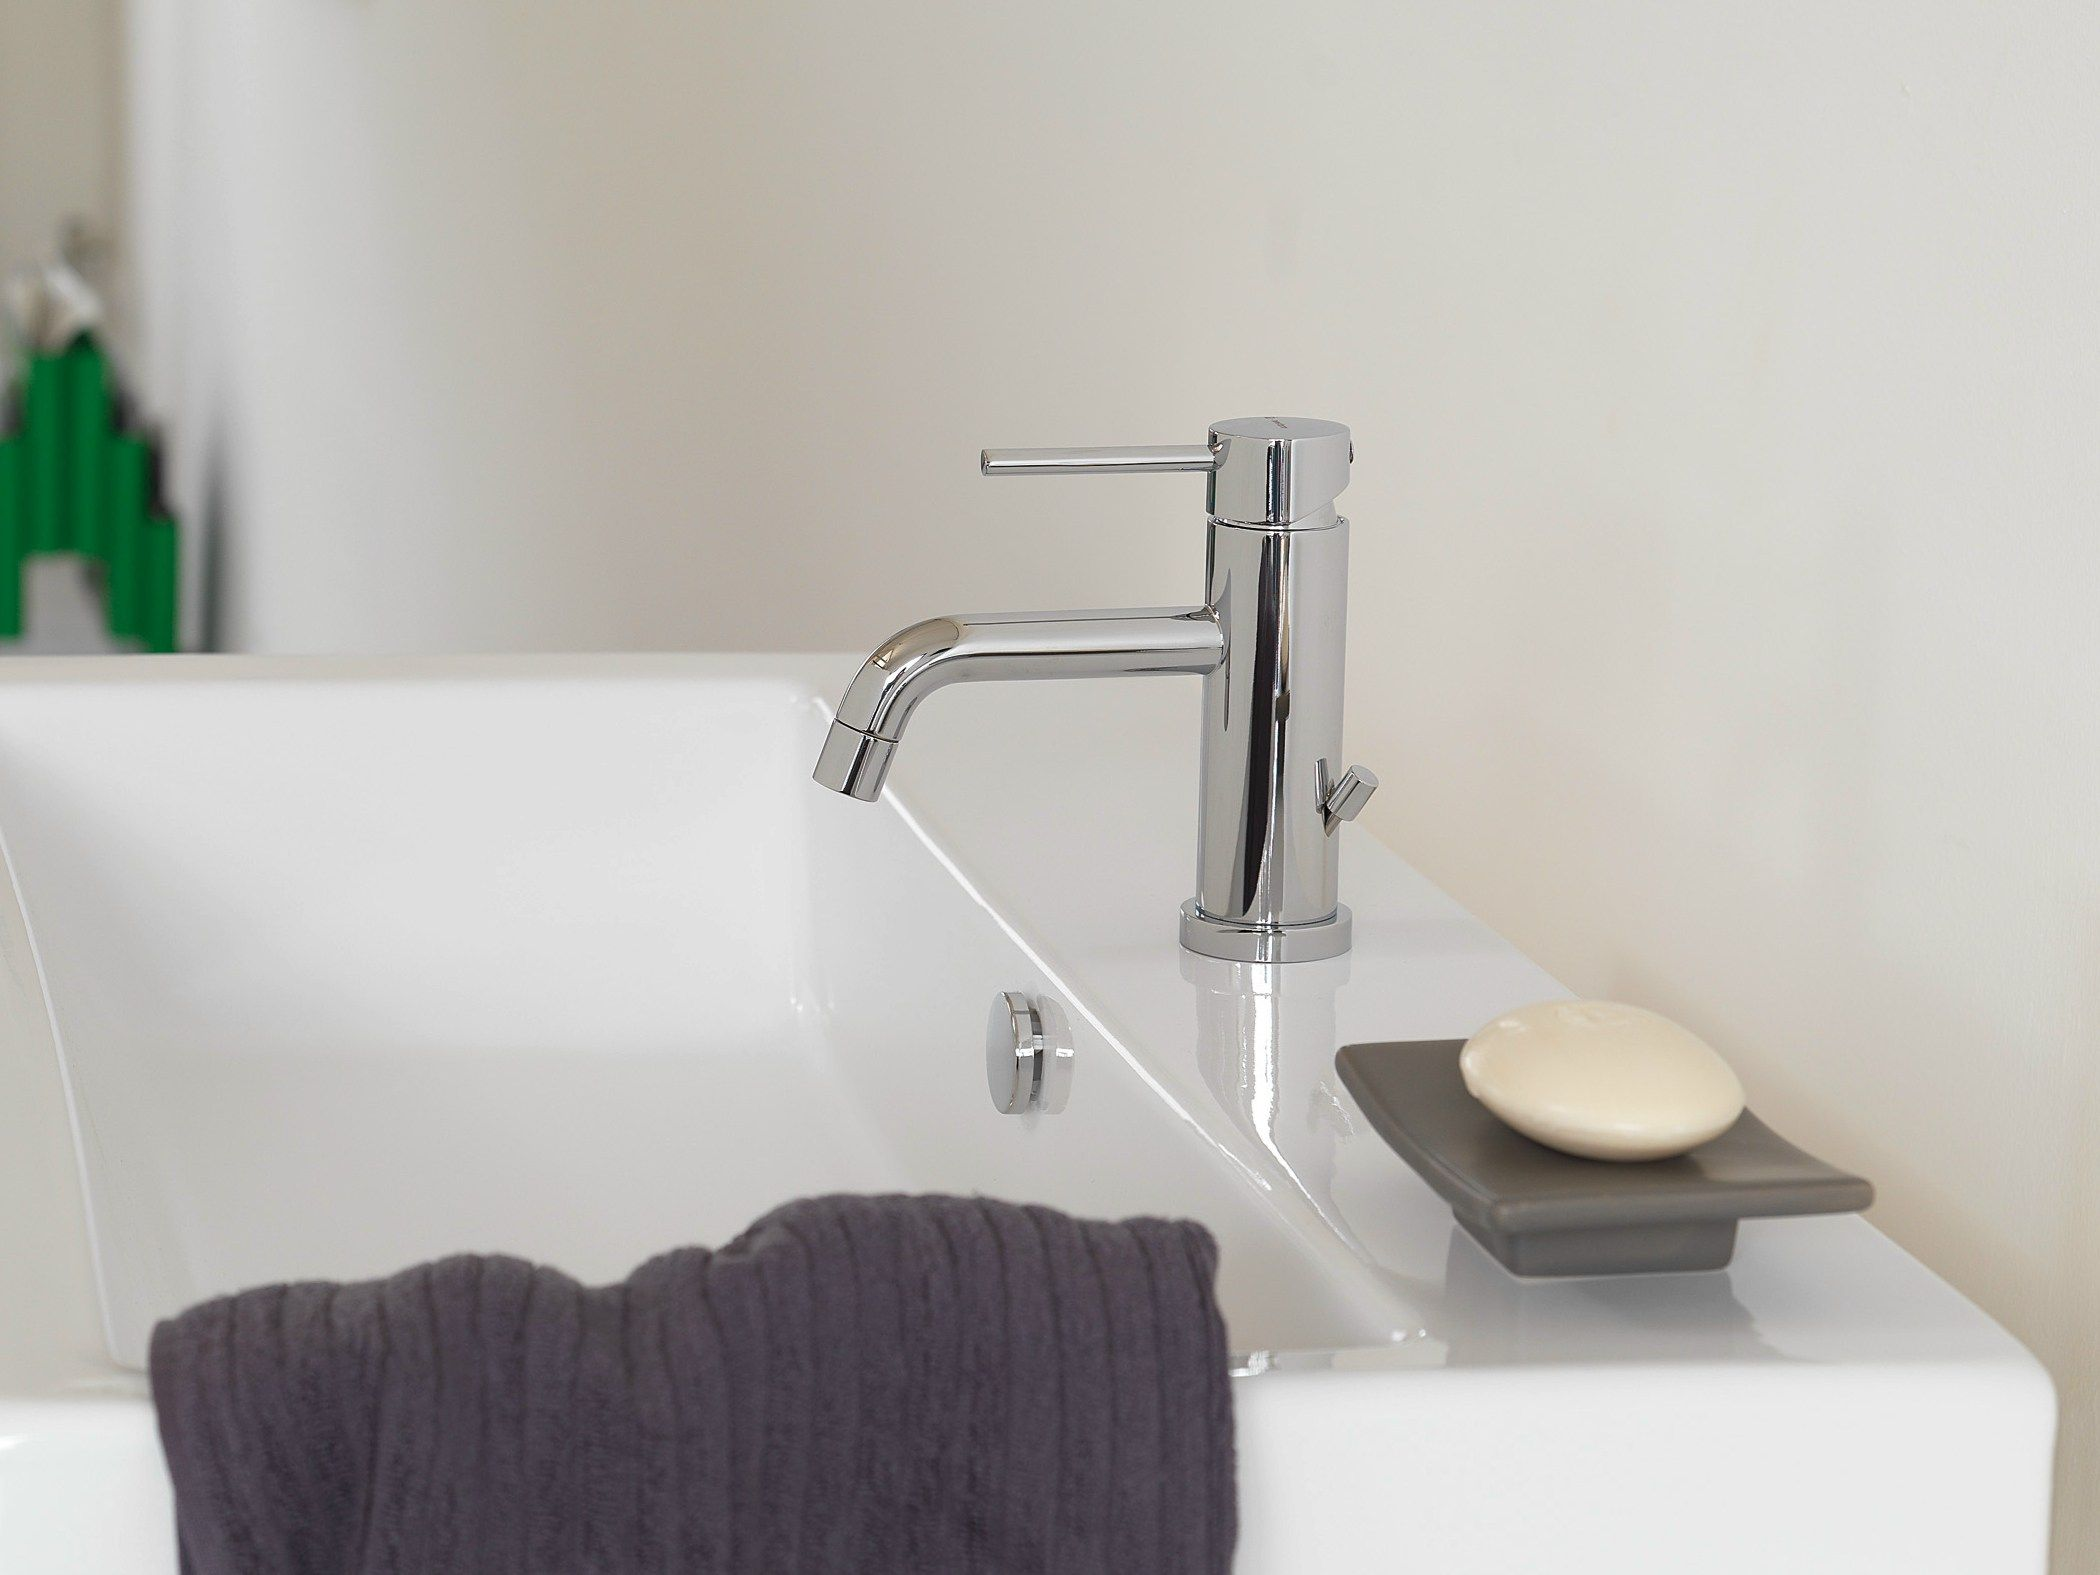 XT Miscelatore per lavabo by #NEWFORM #bath #design | XT | Bath ...